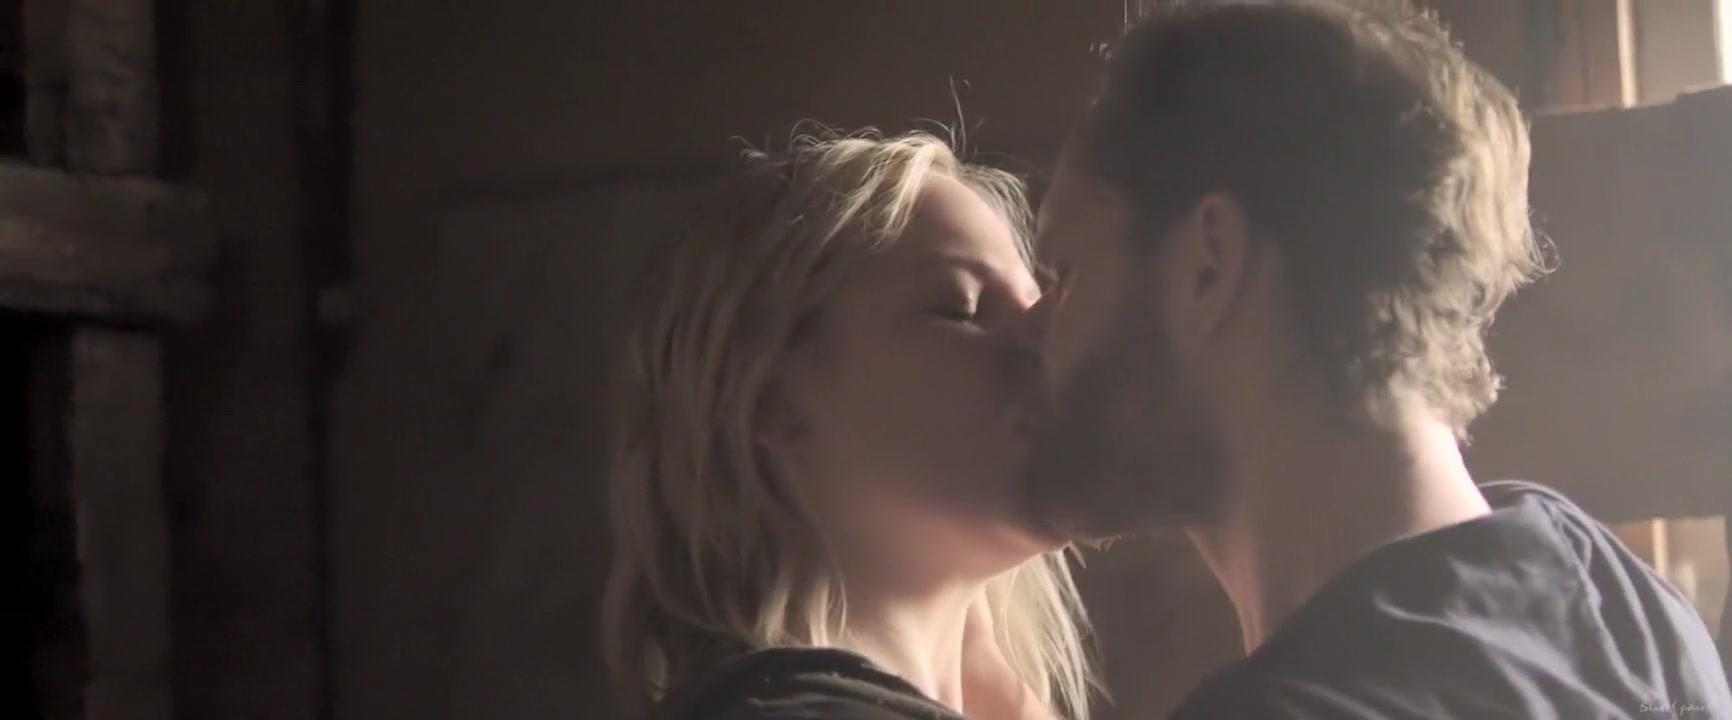 Patrick wilson sex scene nude Hot xXx Video